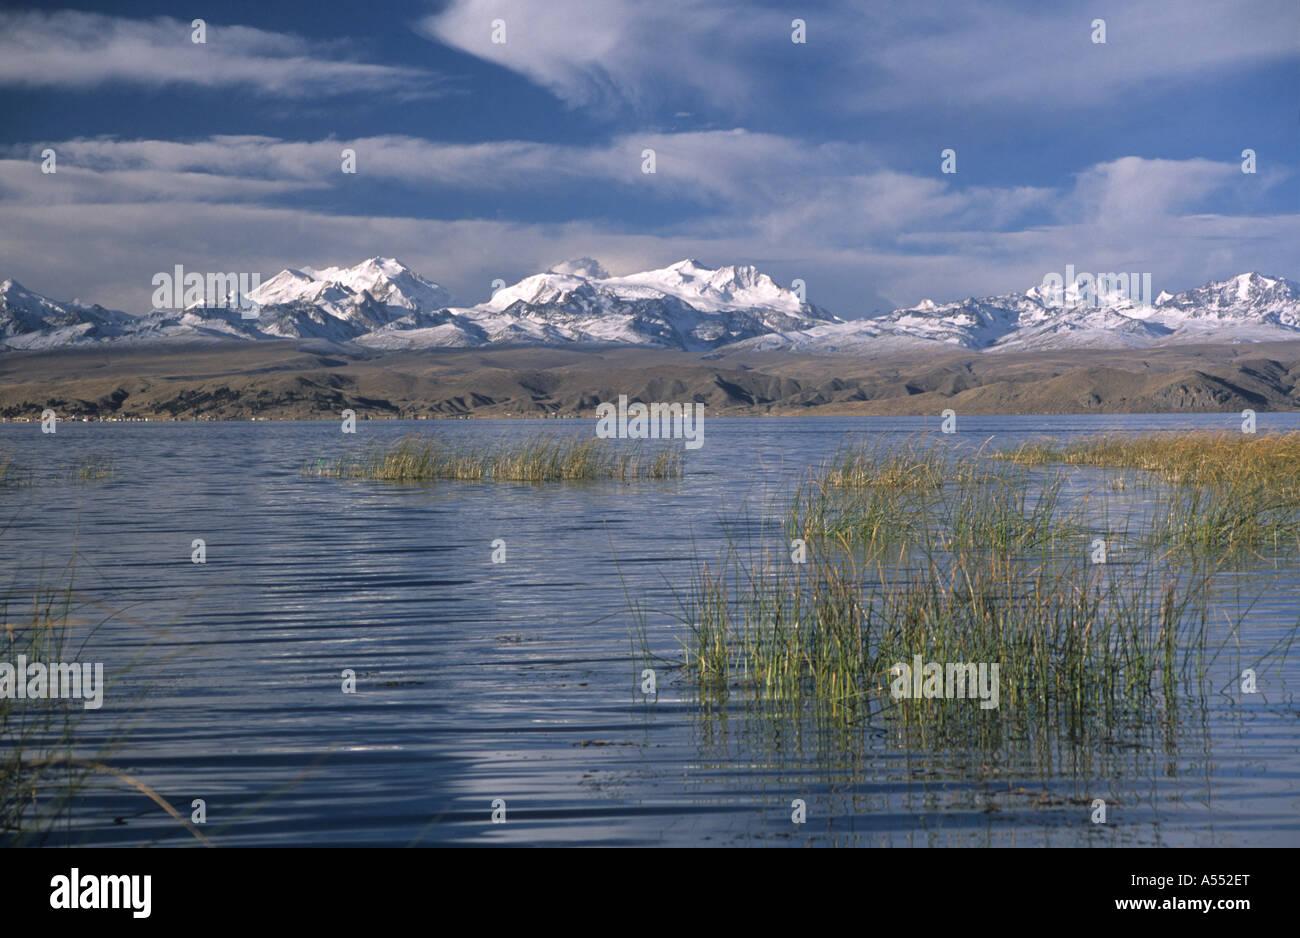 Totora reeds (Schoenoplectus californicus ssp. tatora) and Cordillera Real, Lake Titicaca, Bolivia - Stock Image